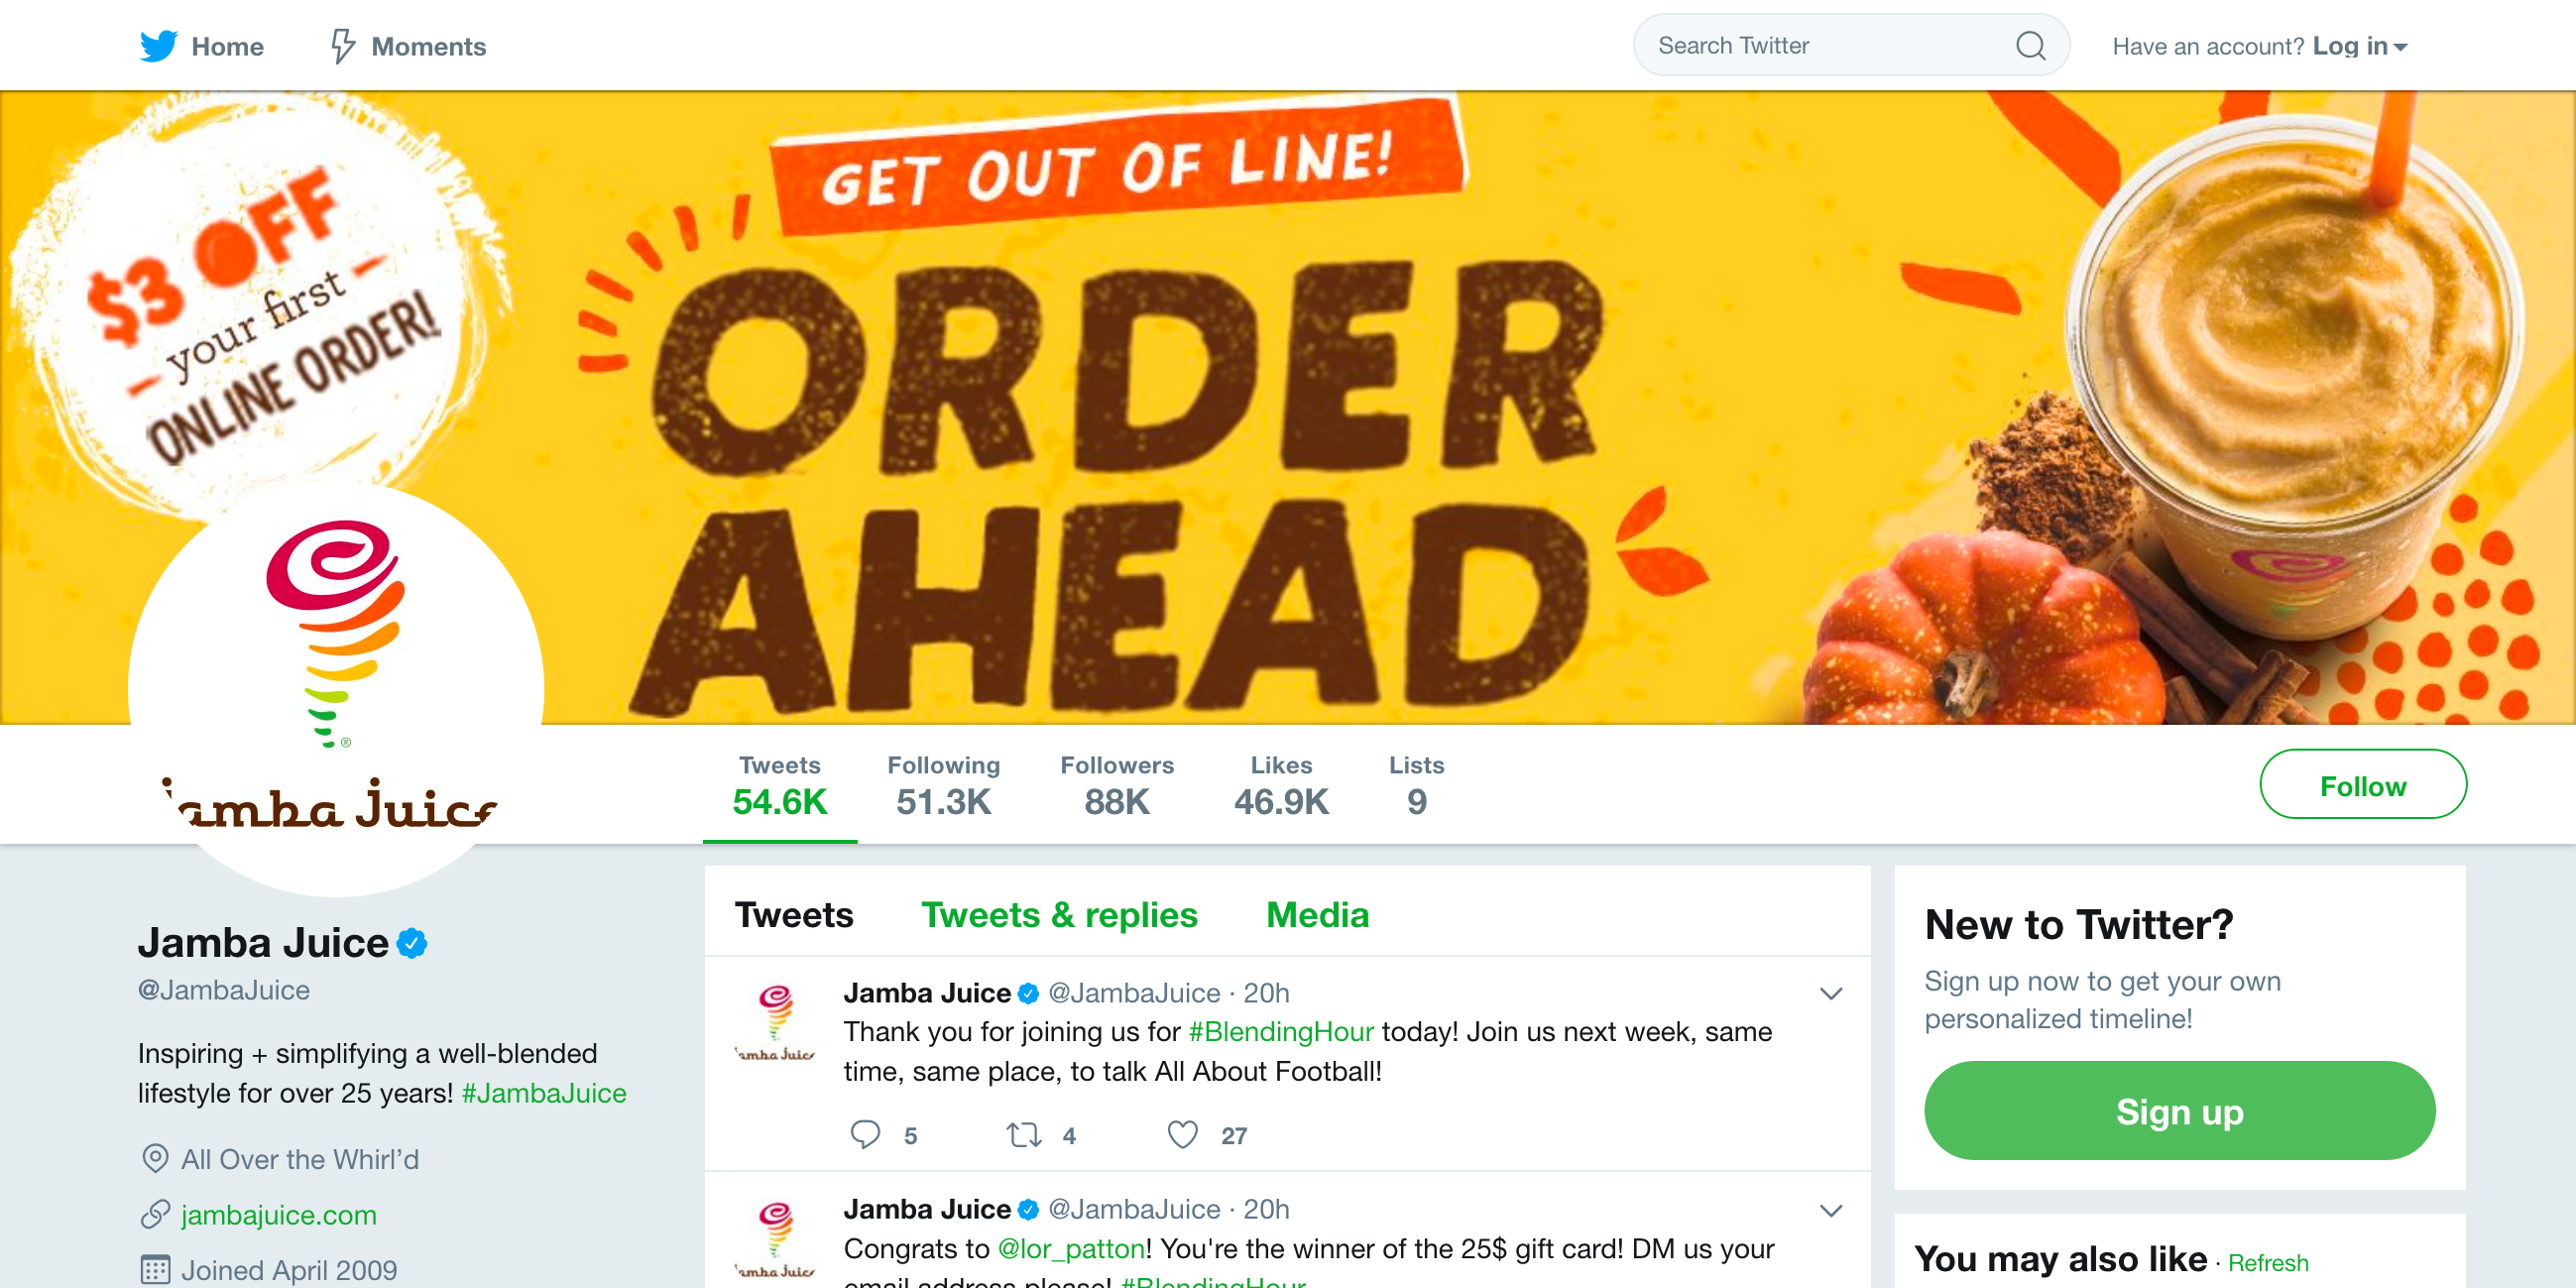 Jamba Juice Twitter profile